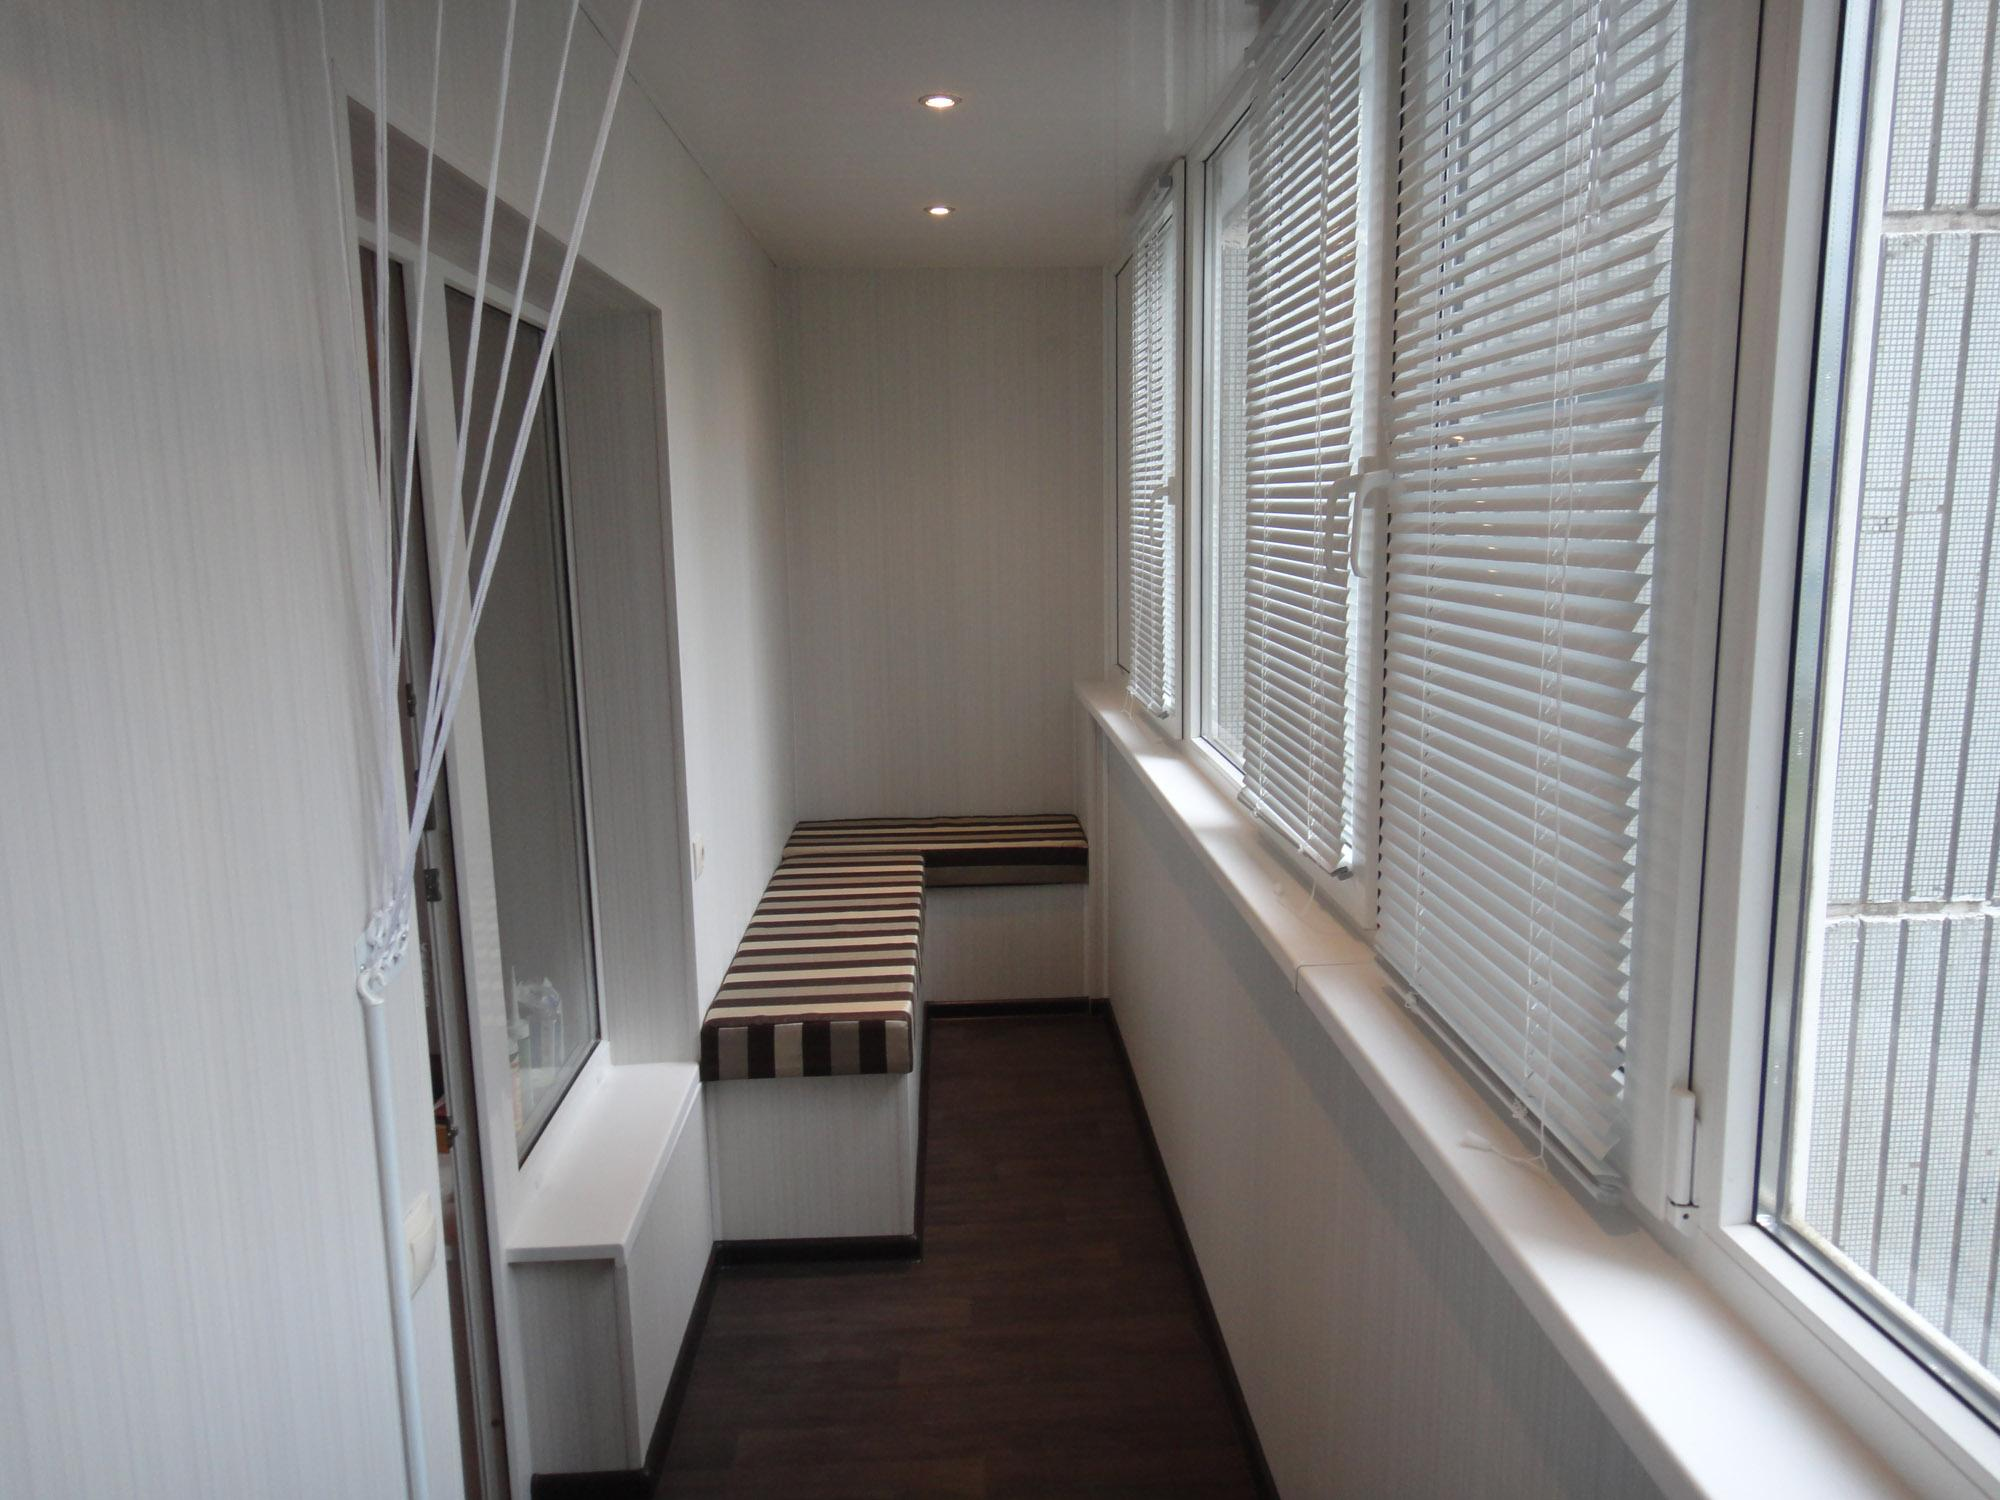 Отделка балконов и лоджий в тюмени - балкон-комплекс.